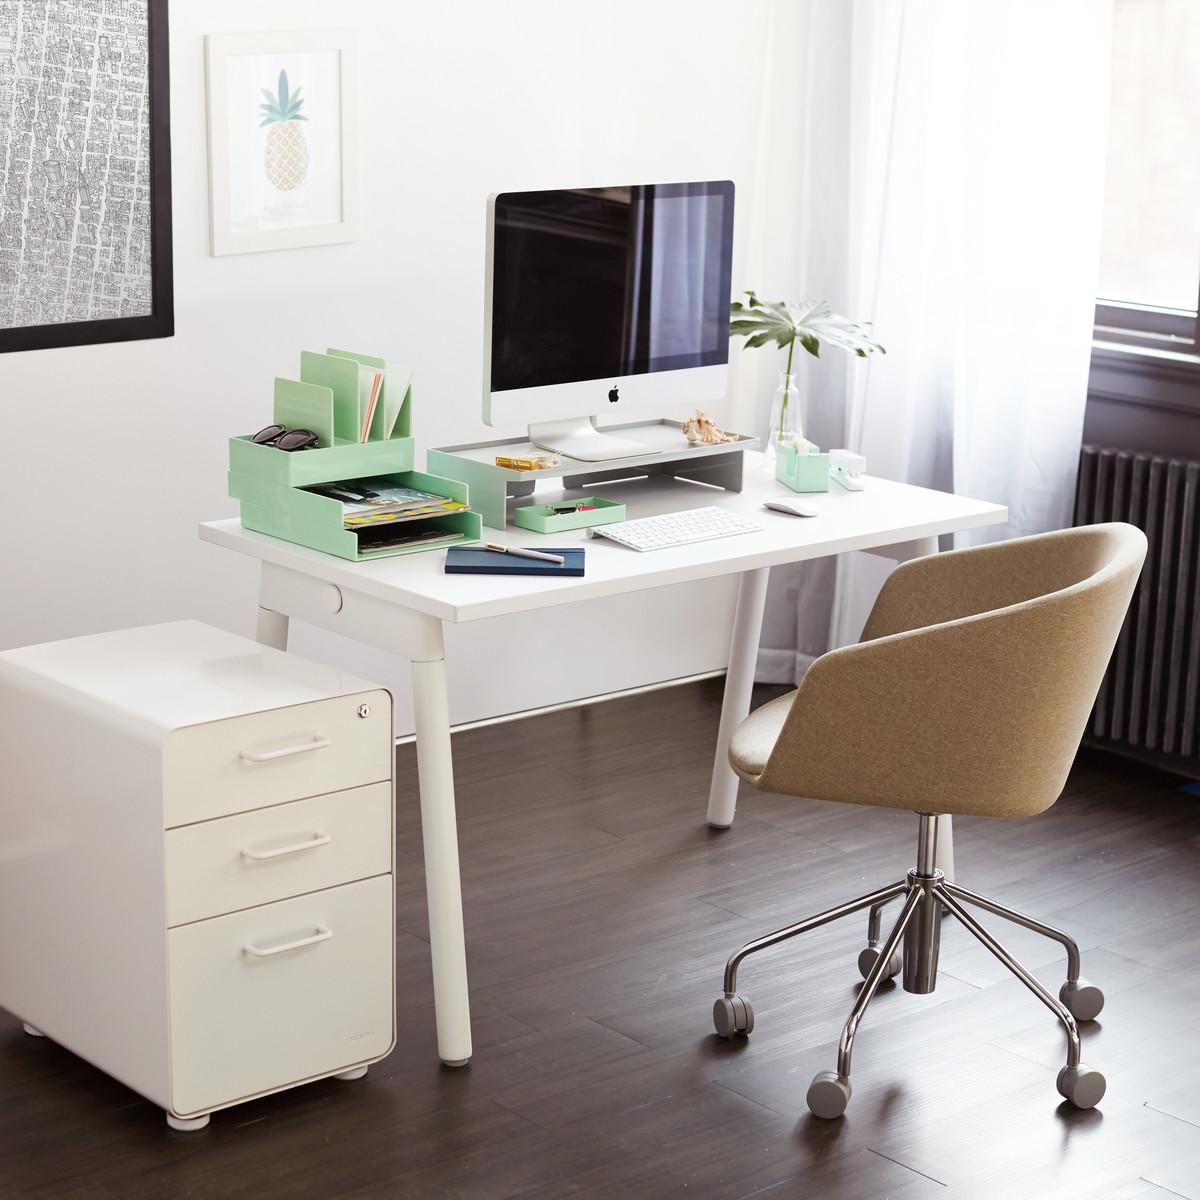 poppin-chair